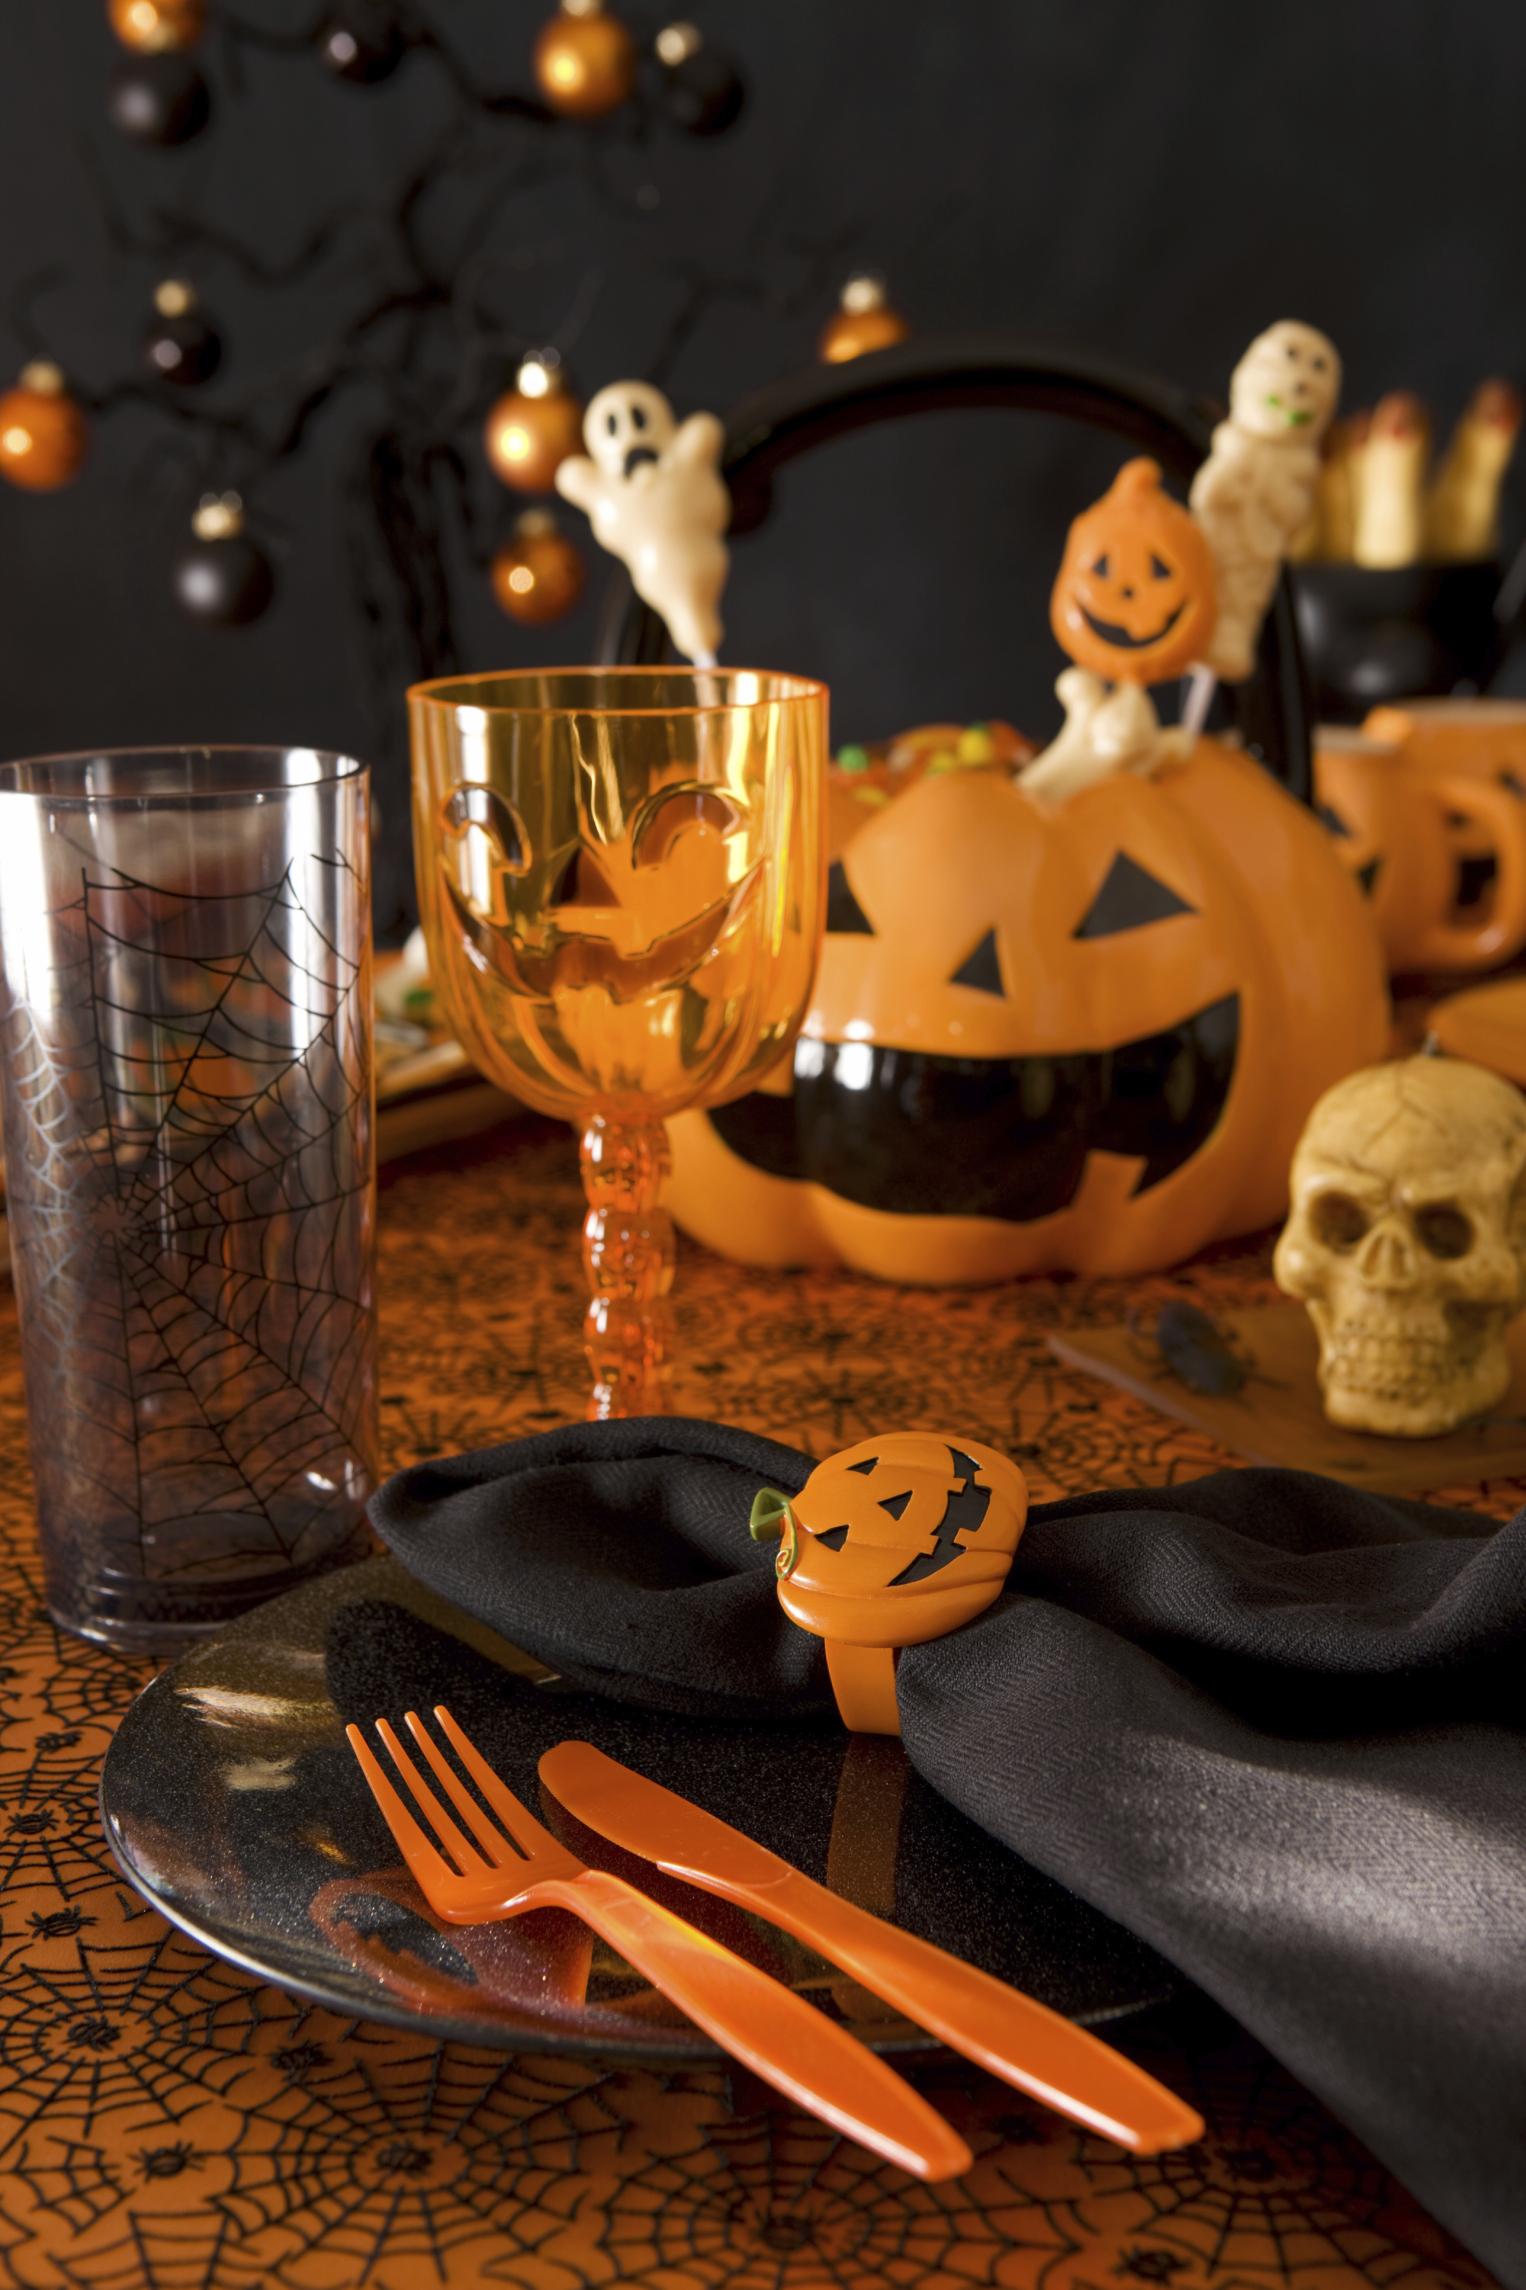 Easy Scary Halloween Table Settings